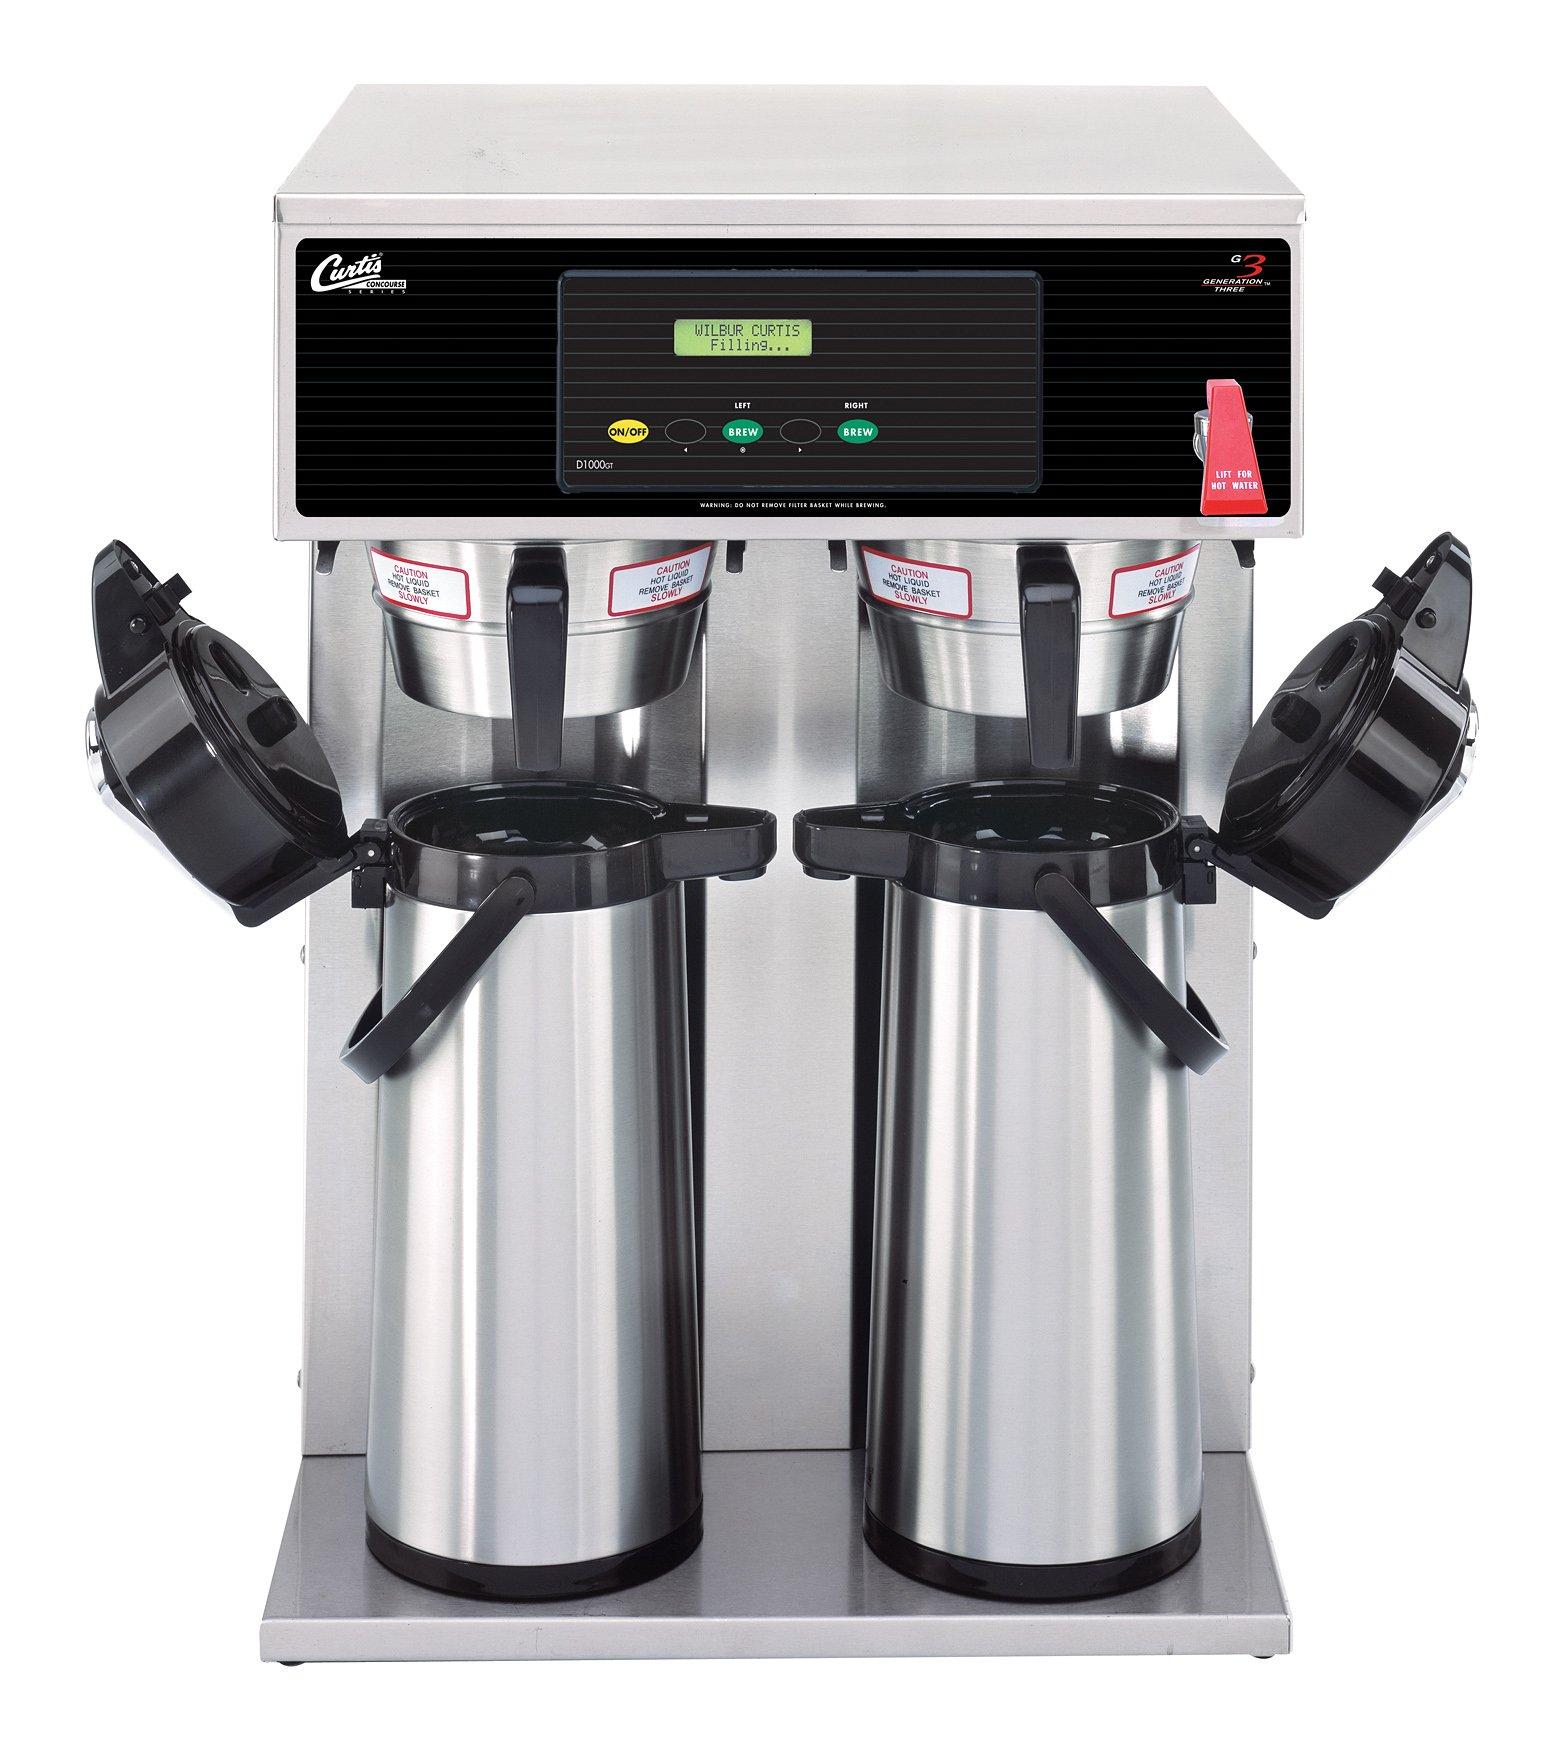 Wilbur Curtis G3 Airpot Brewer 2.2L To 2.5L Twin/Standard Airpot Coffee Brewer Dual Voltage - Commercial Airpot Coffee Brewer  - D1000GT63A000 (Each) by Wilbur Curtis